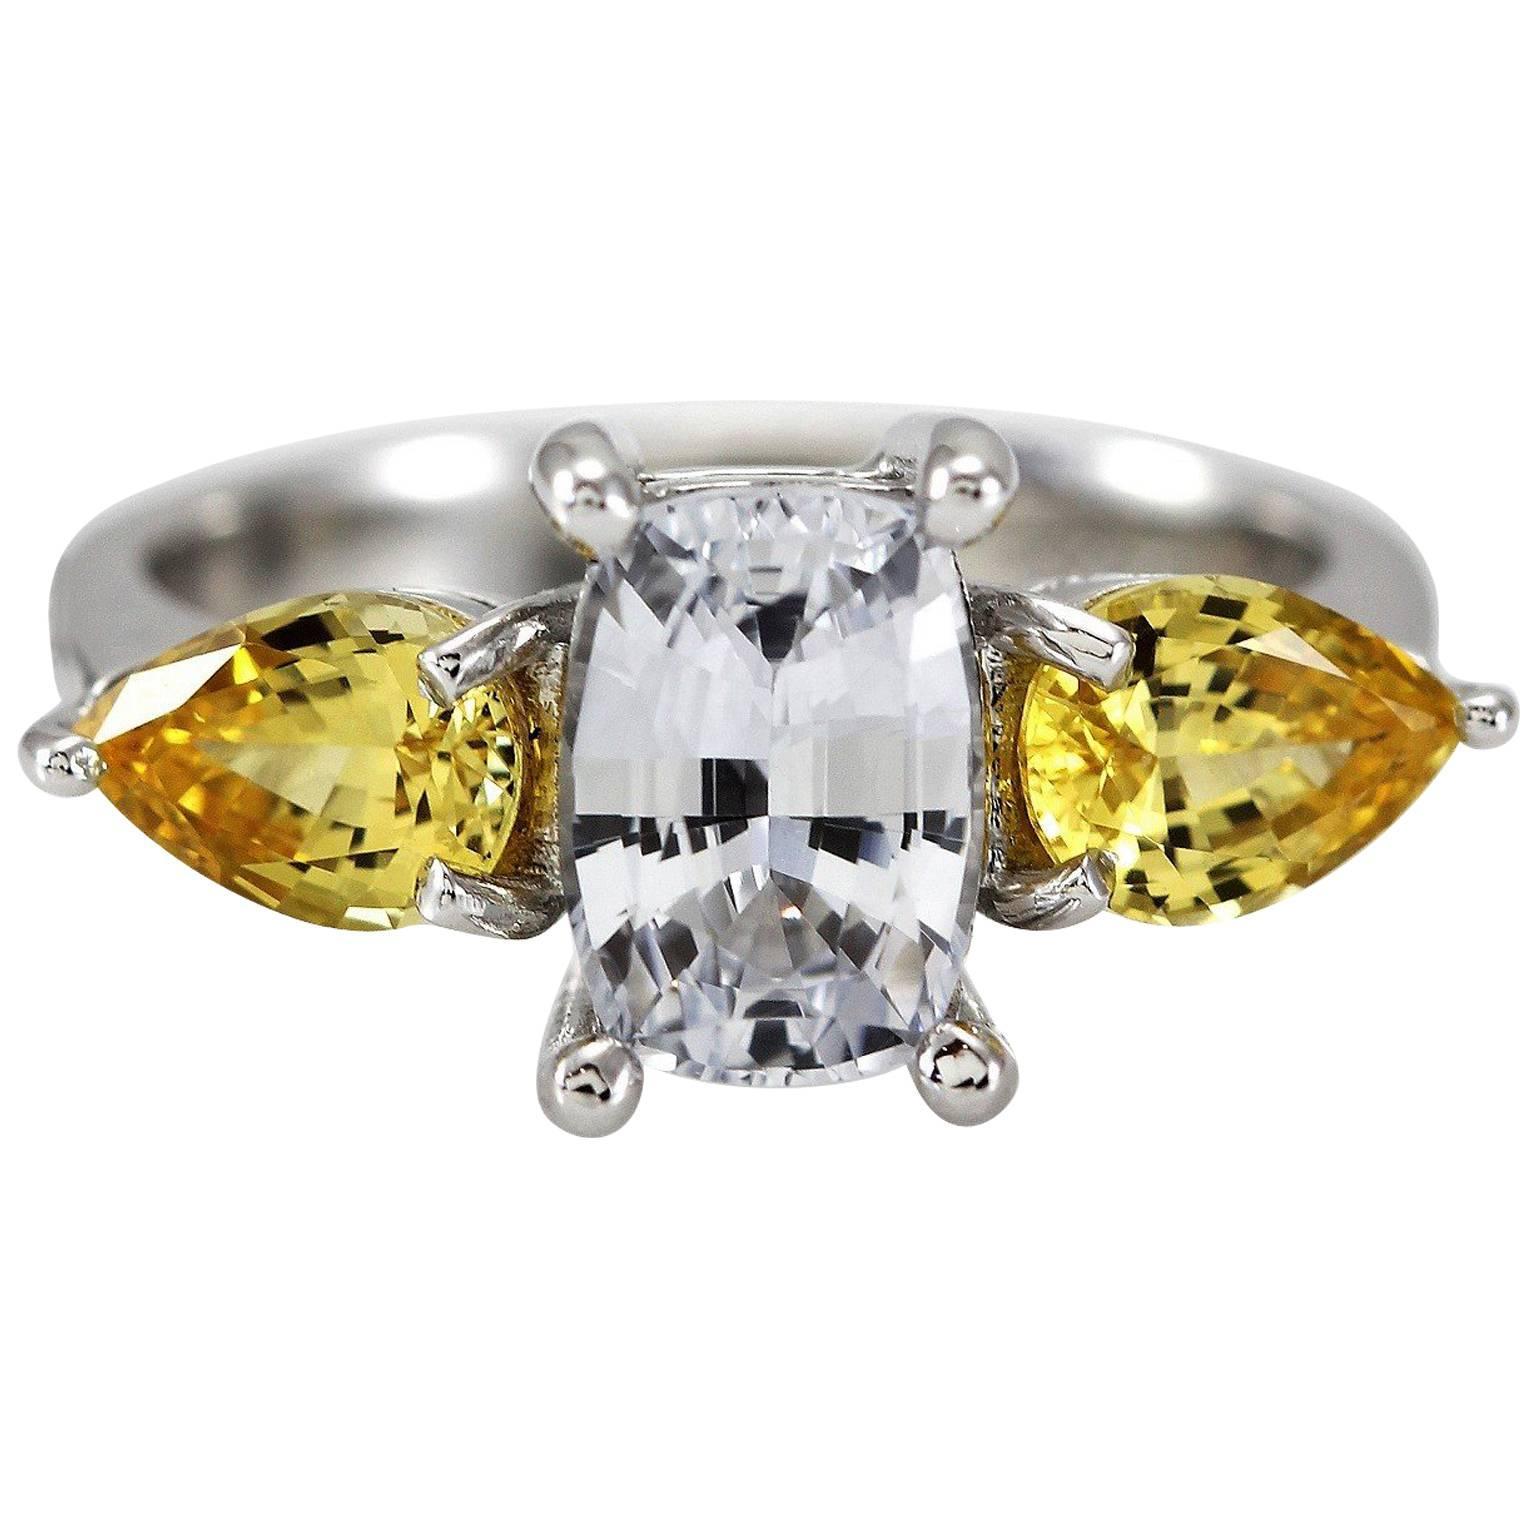 Daou Jewellery White Gold & Diamond Spark Ring - UK O 1/2 - US 7 1/4 - EU 55 3/4 cwLp4gpwY